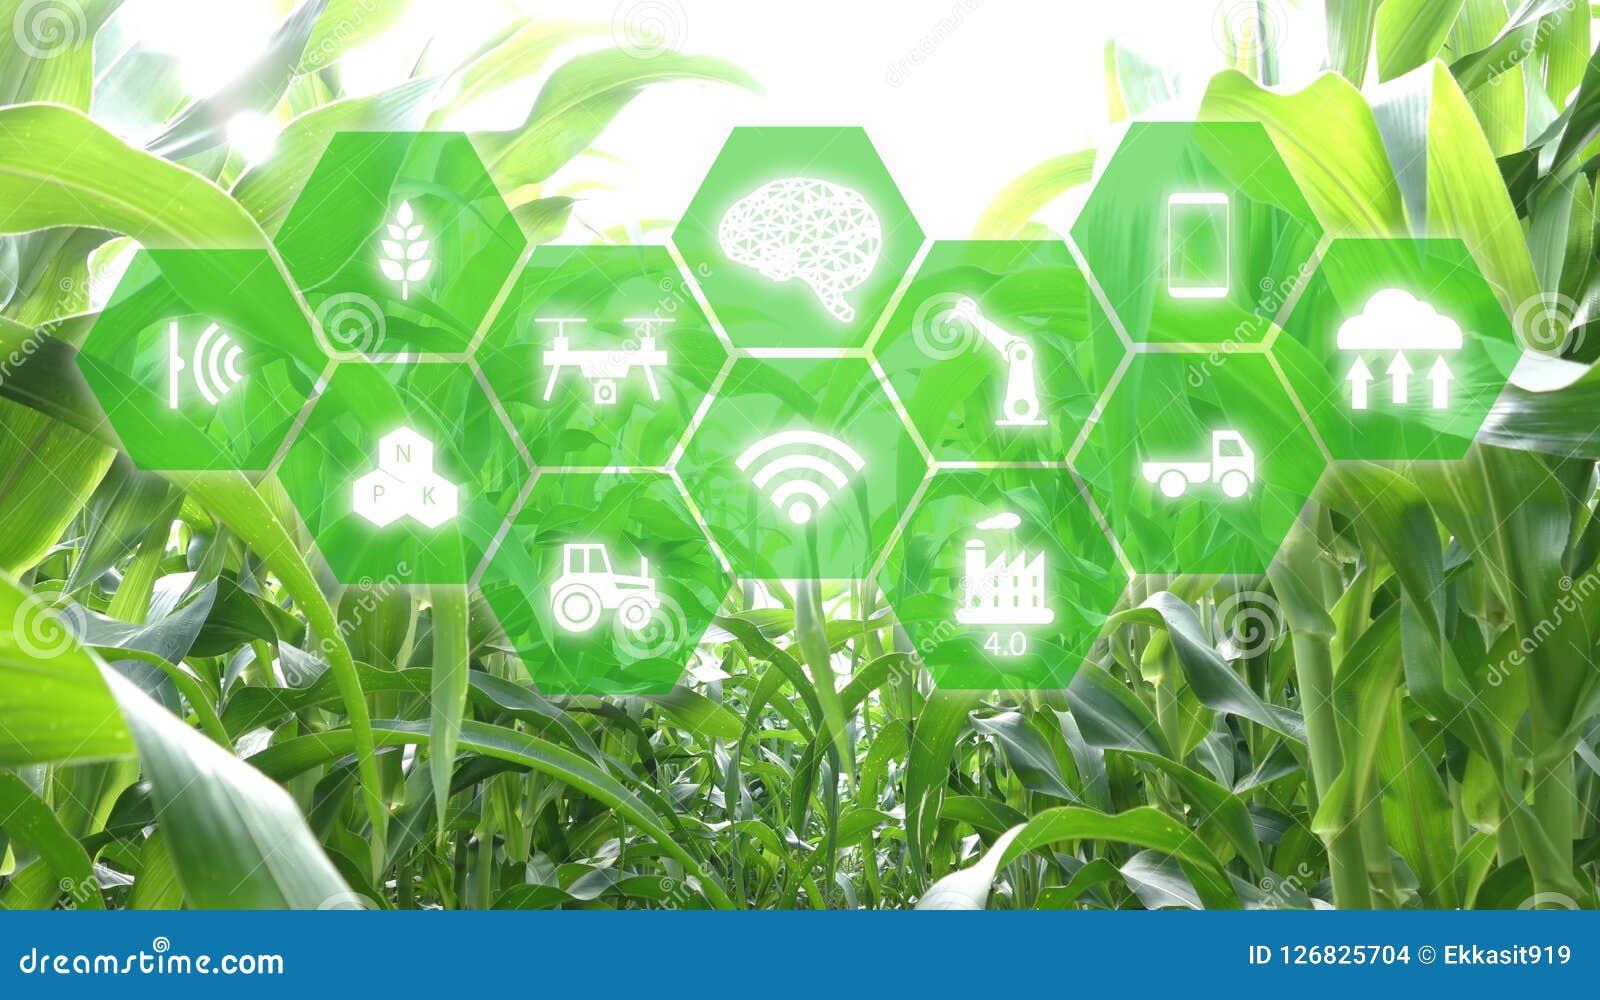 Iot,事互联网,农业概念,管理的,控制, monitorin聪明的机器人人工智能ai用途